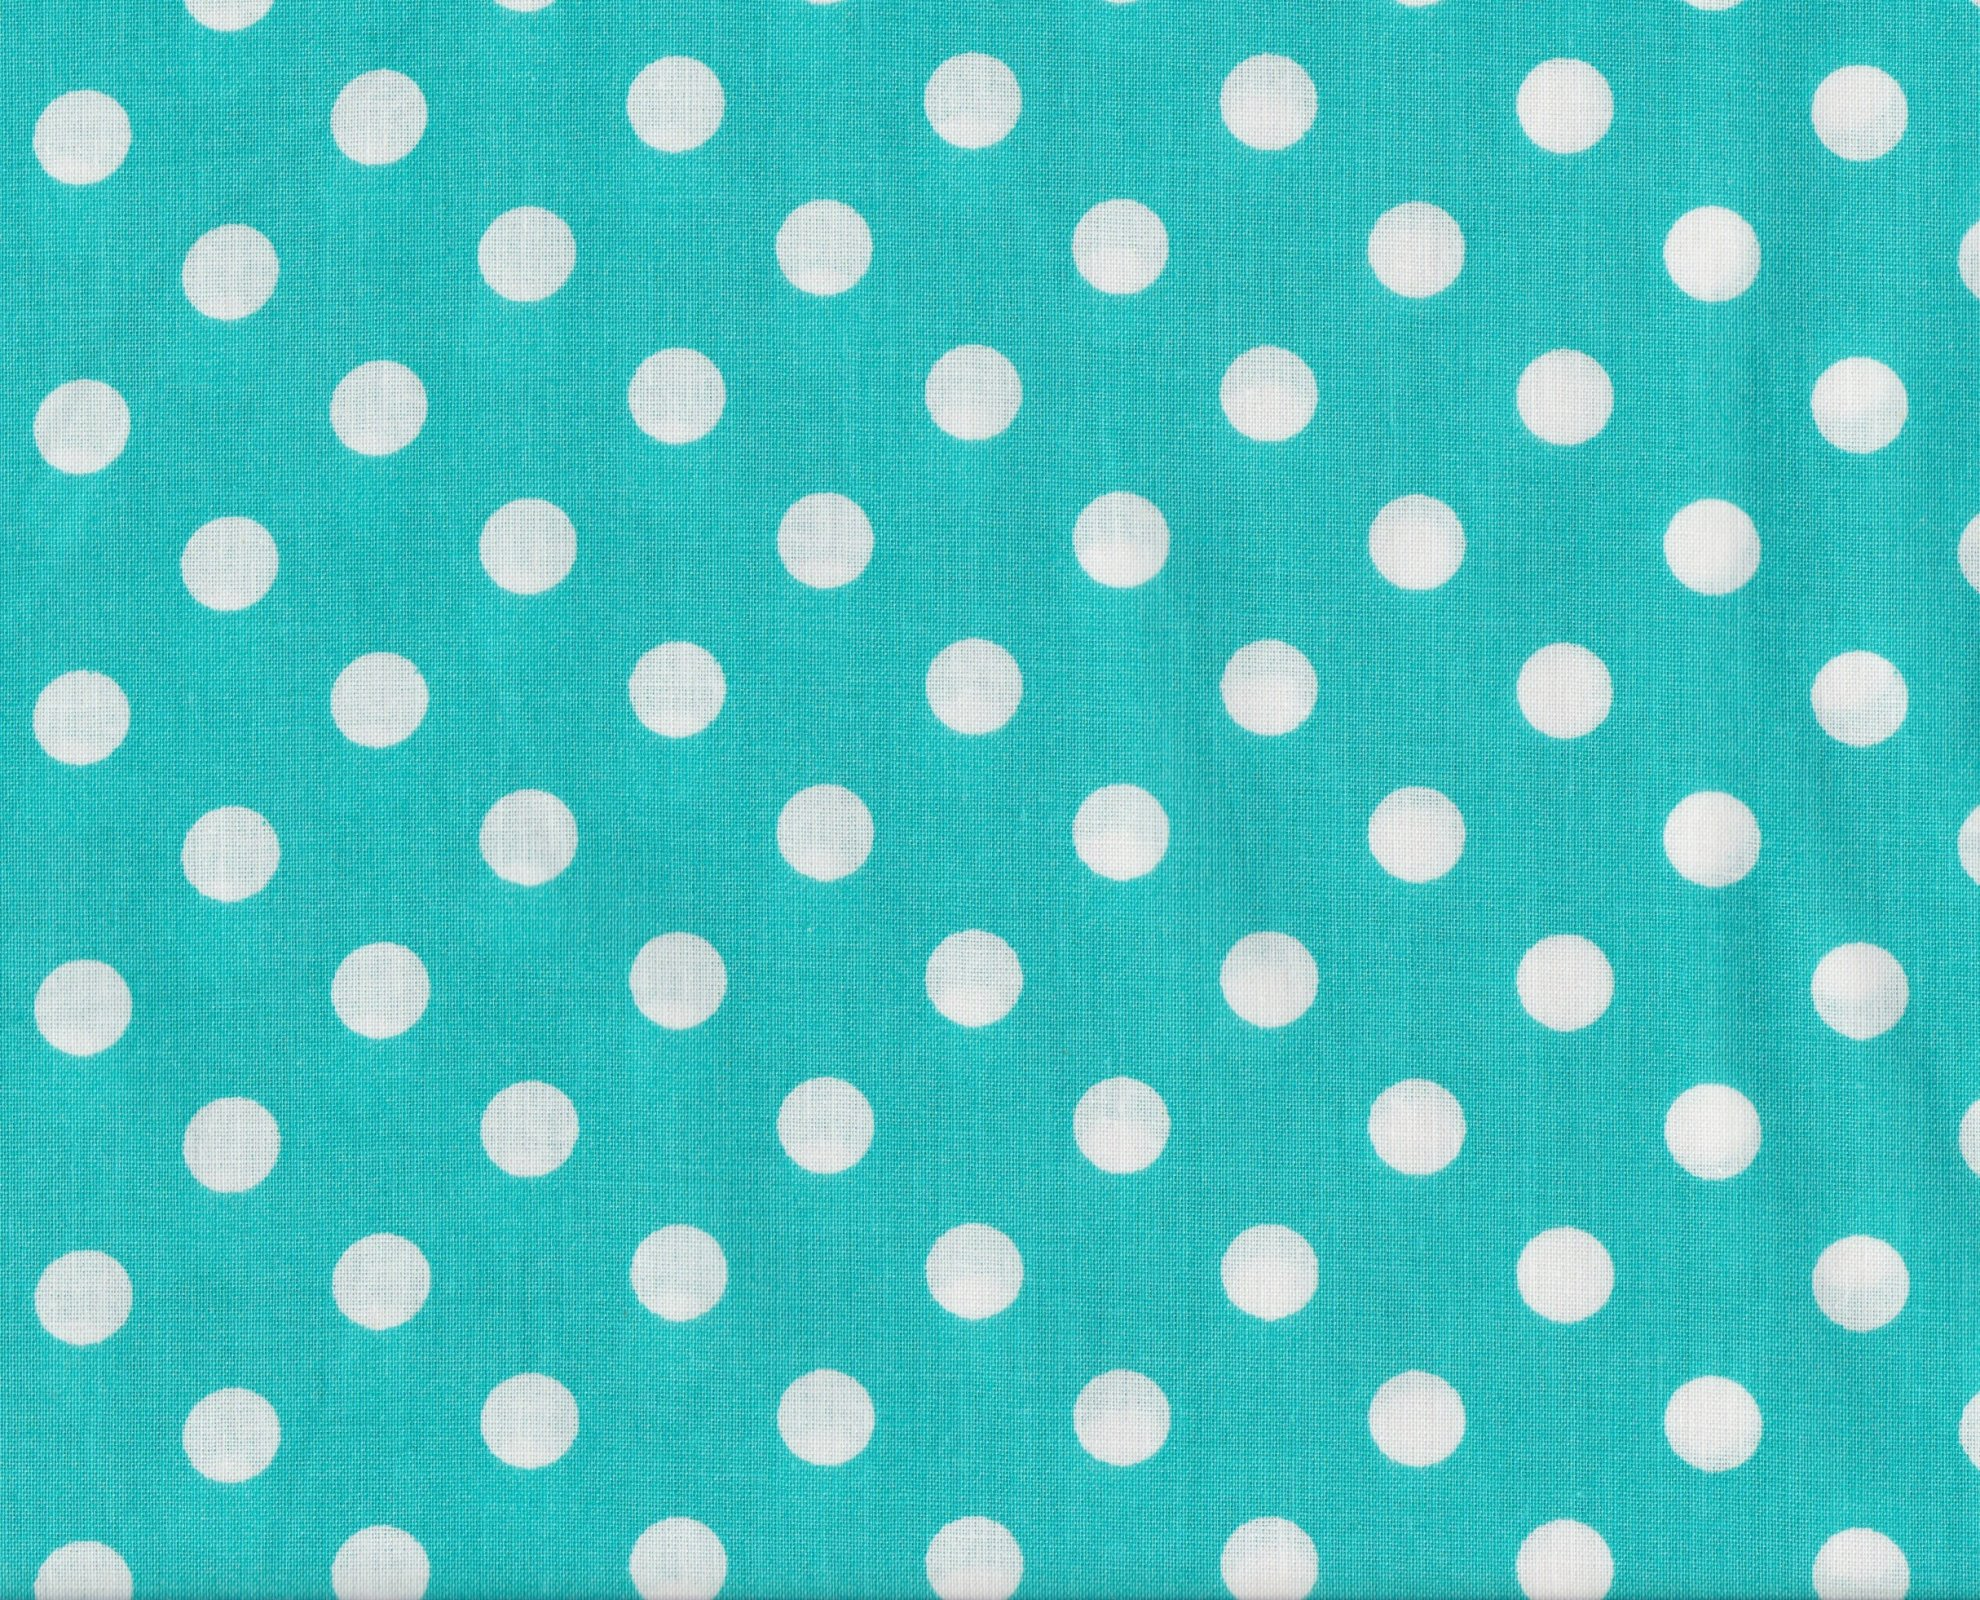 PROMO* FT-Novelty Prints - White Polka Dots on Turquoise